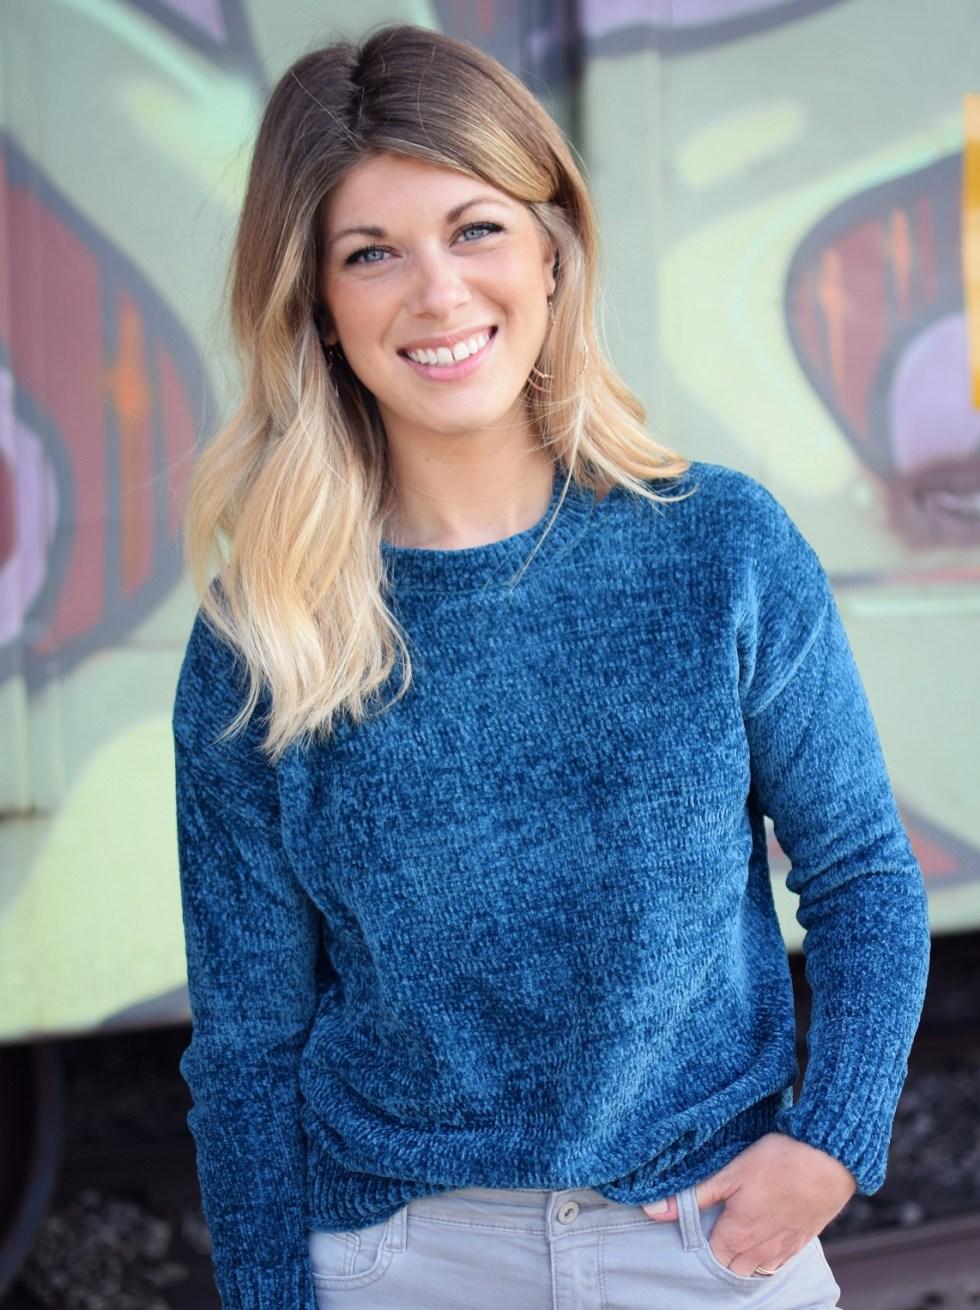 Kohls sweater, black friday deals